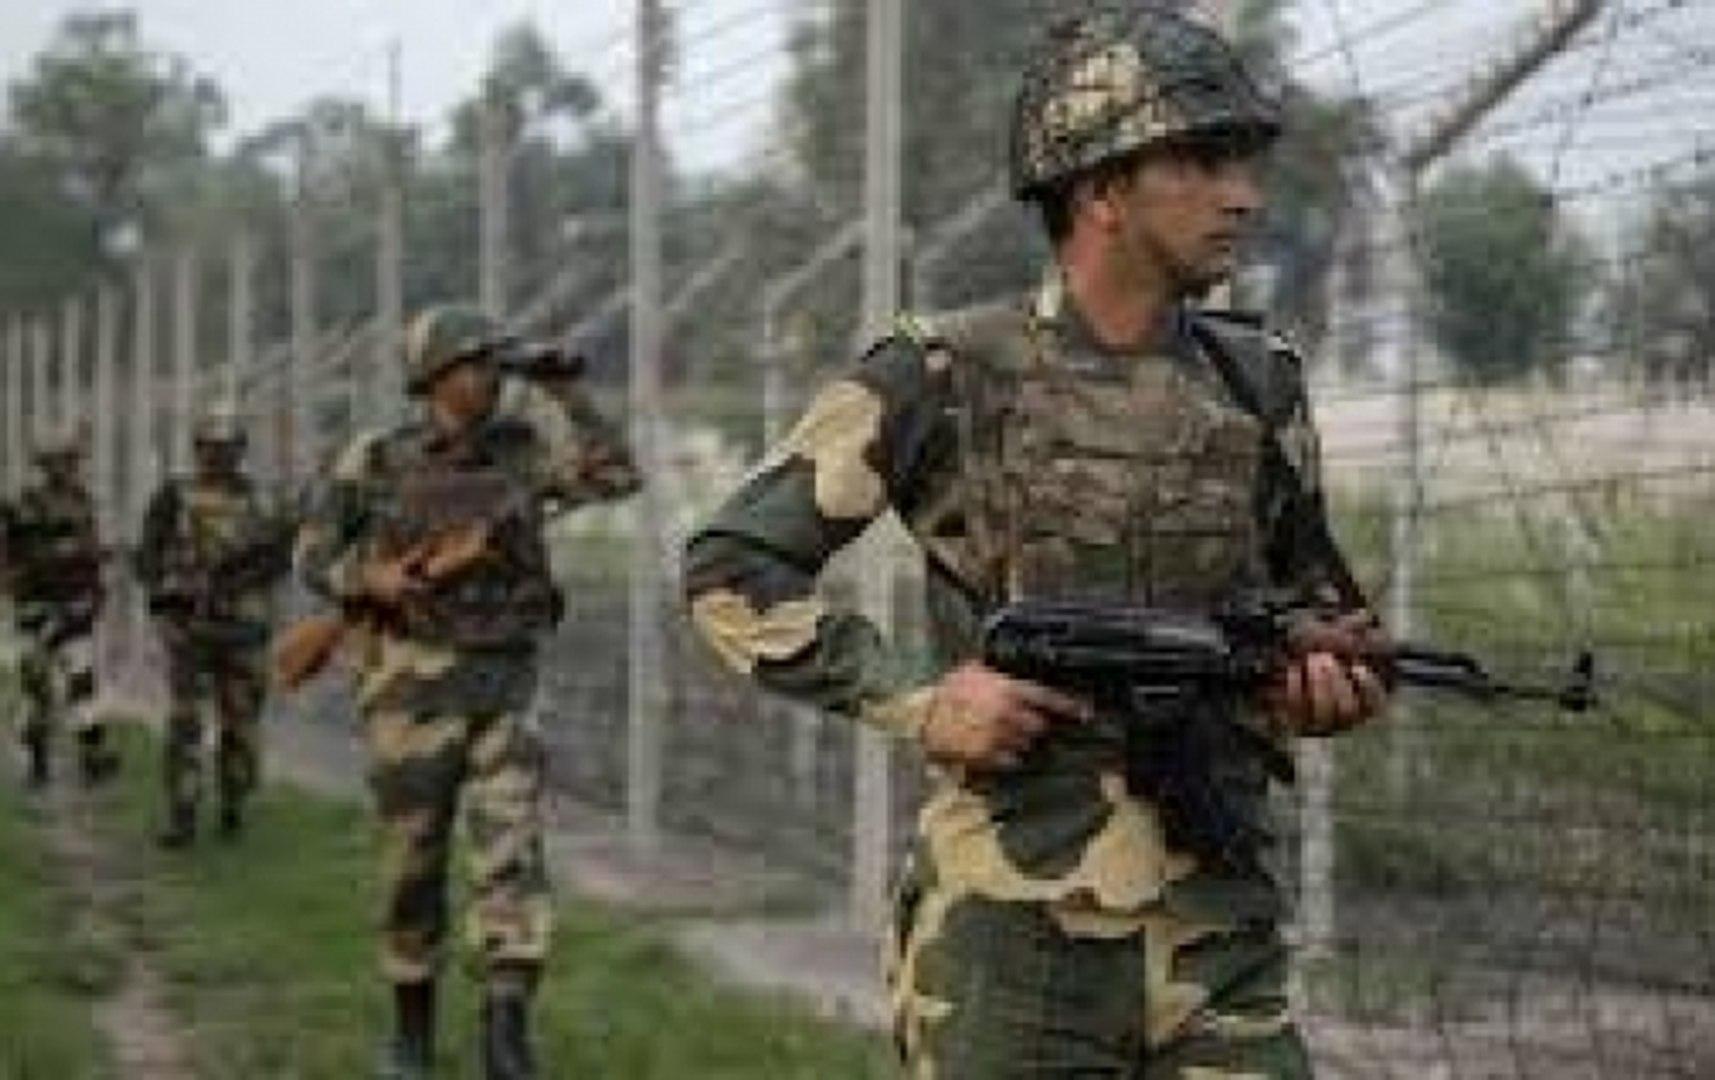 J-K: Pak Army violates ceasefire along LoC in Krishna Ghati sector